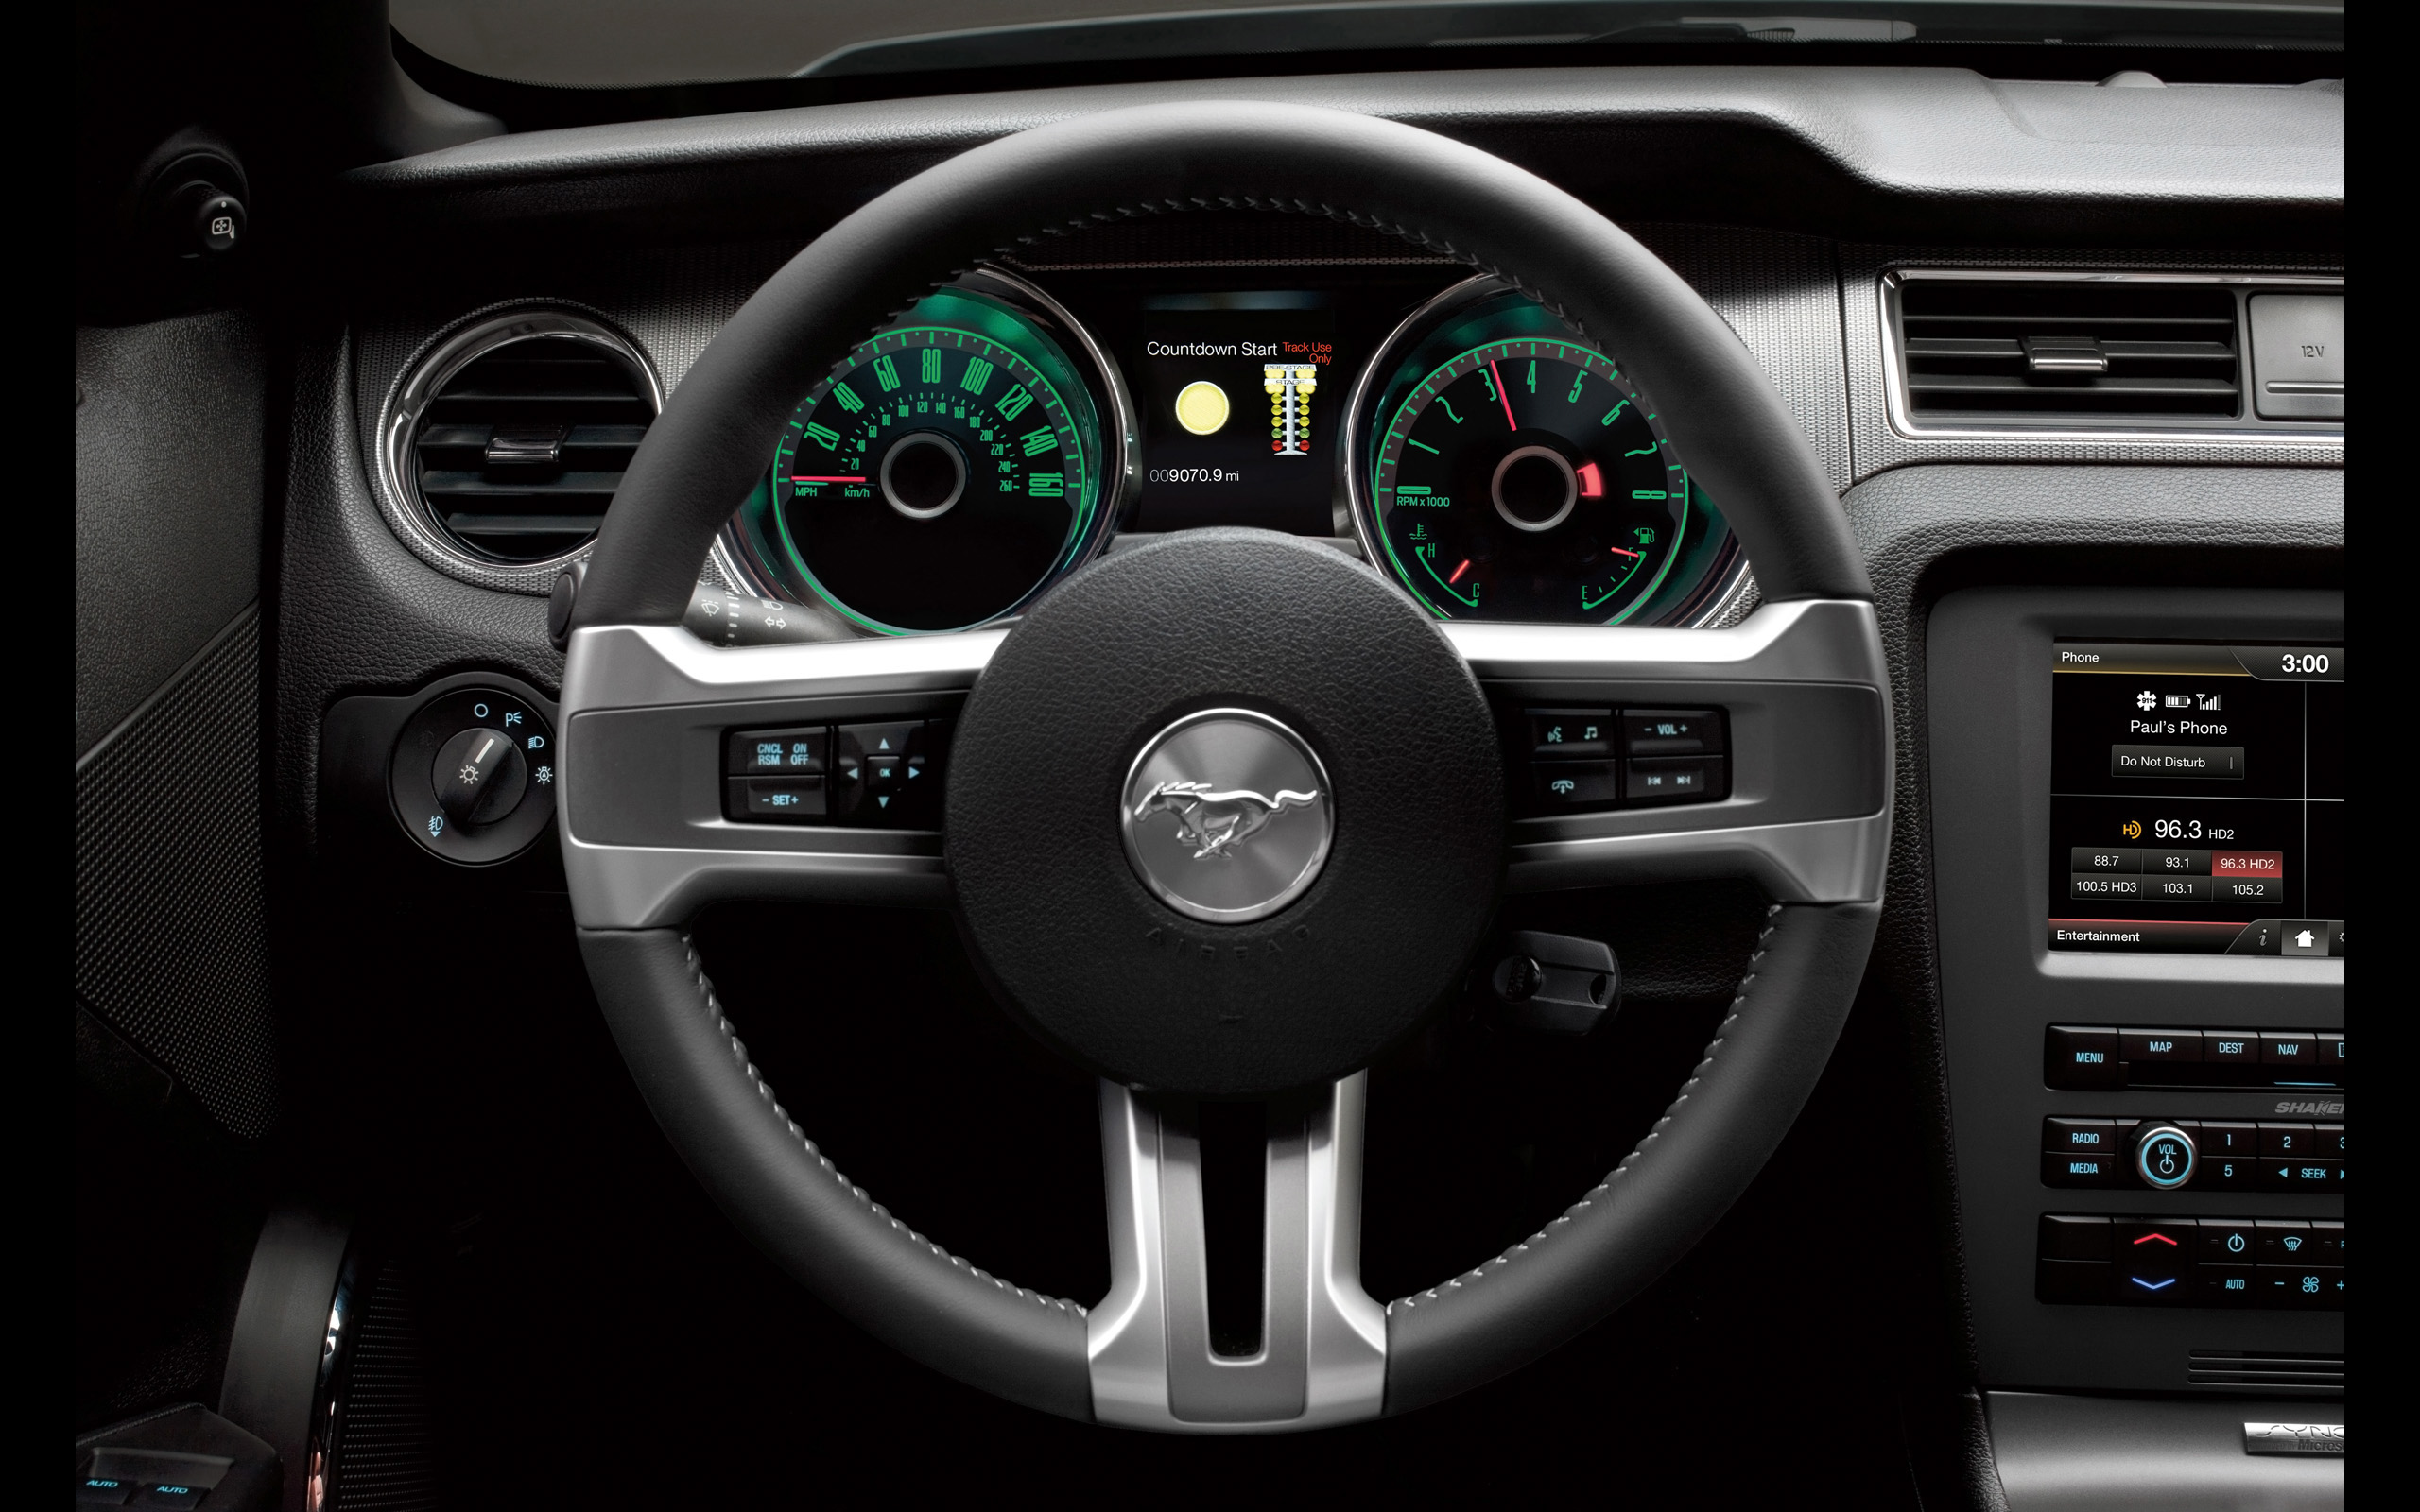 2016 ford mustang interior u s news amp world report - 2014 Ford Mustang Muscle Interior T Wallpaper 2560x1600 149380 Wallpaperup